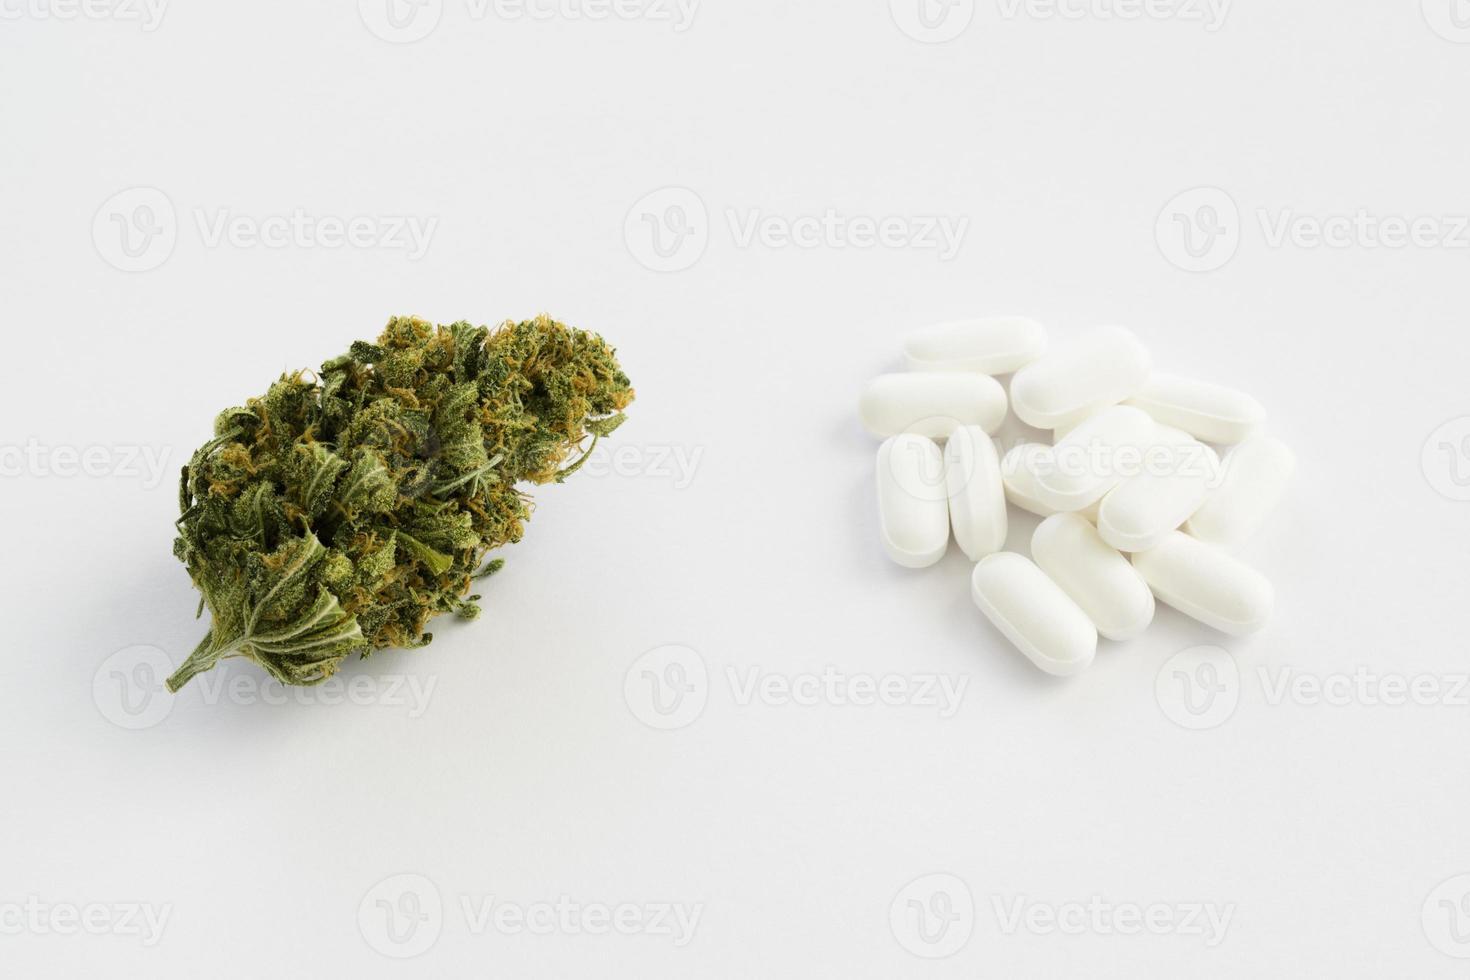 bourgeon de marijuana vs pilules sur ordonnance photo